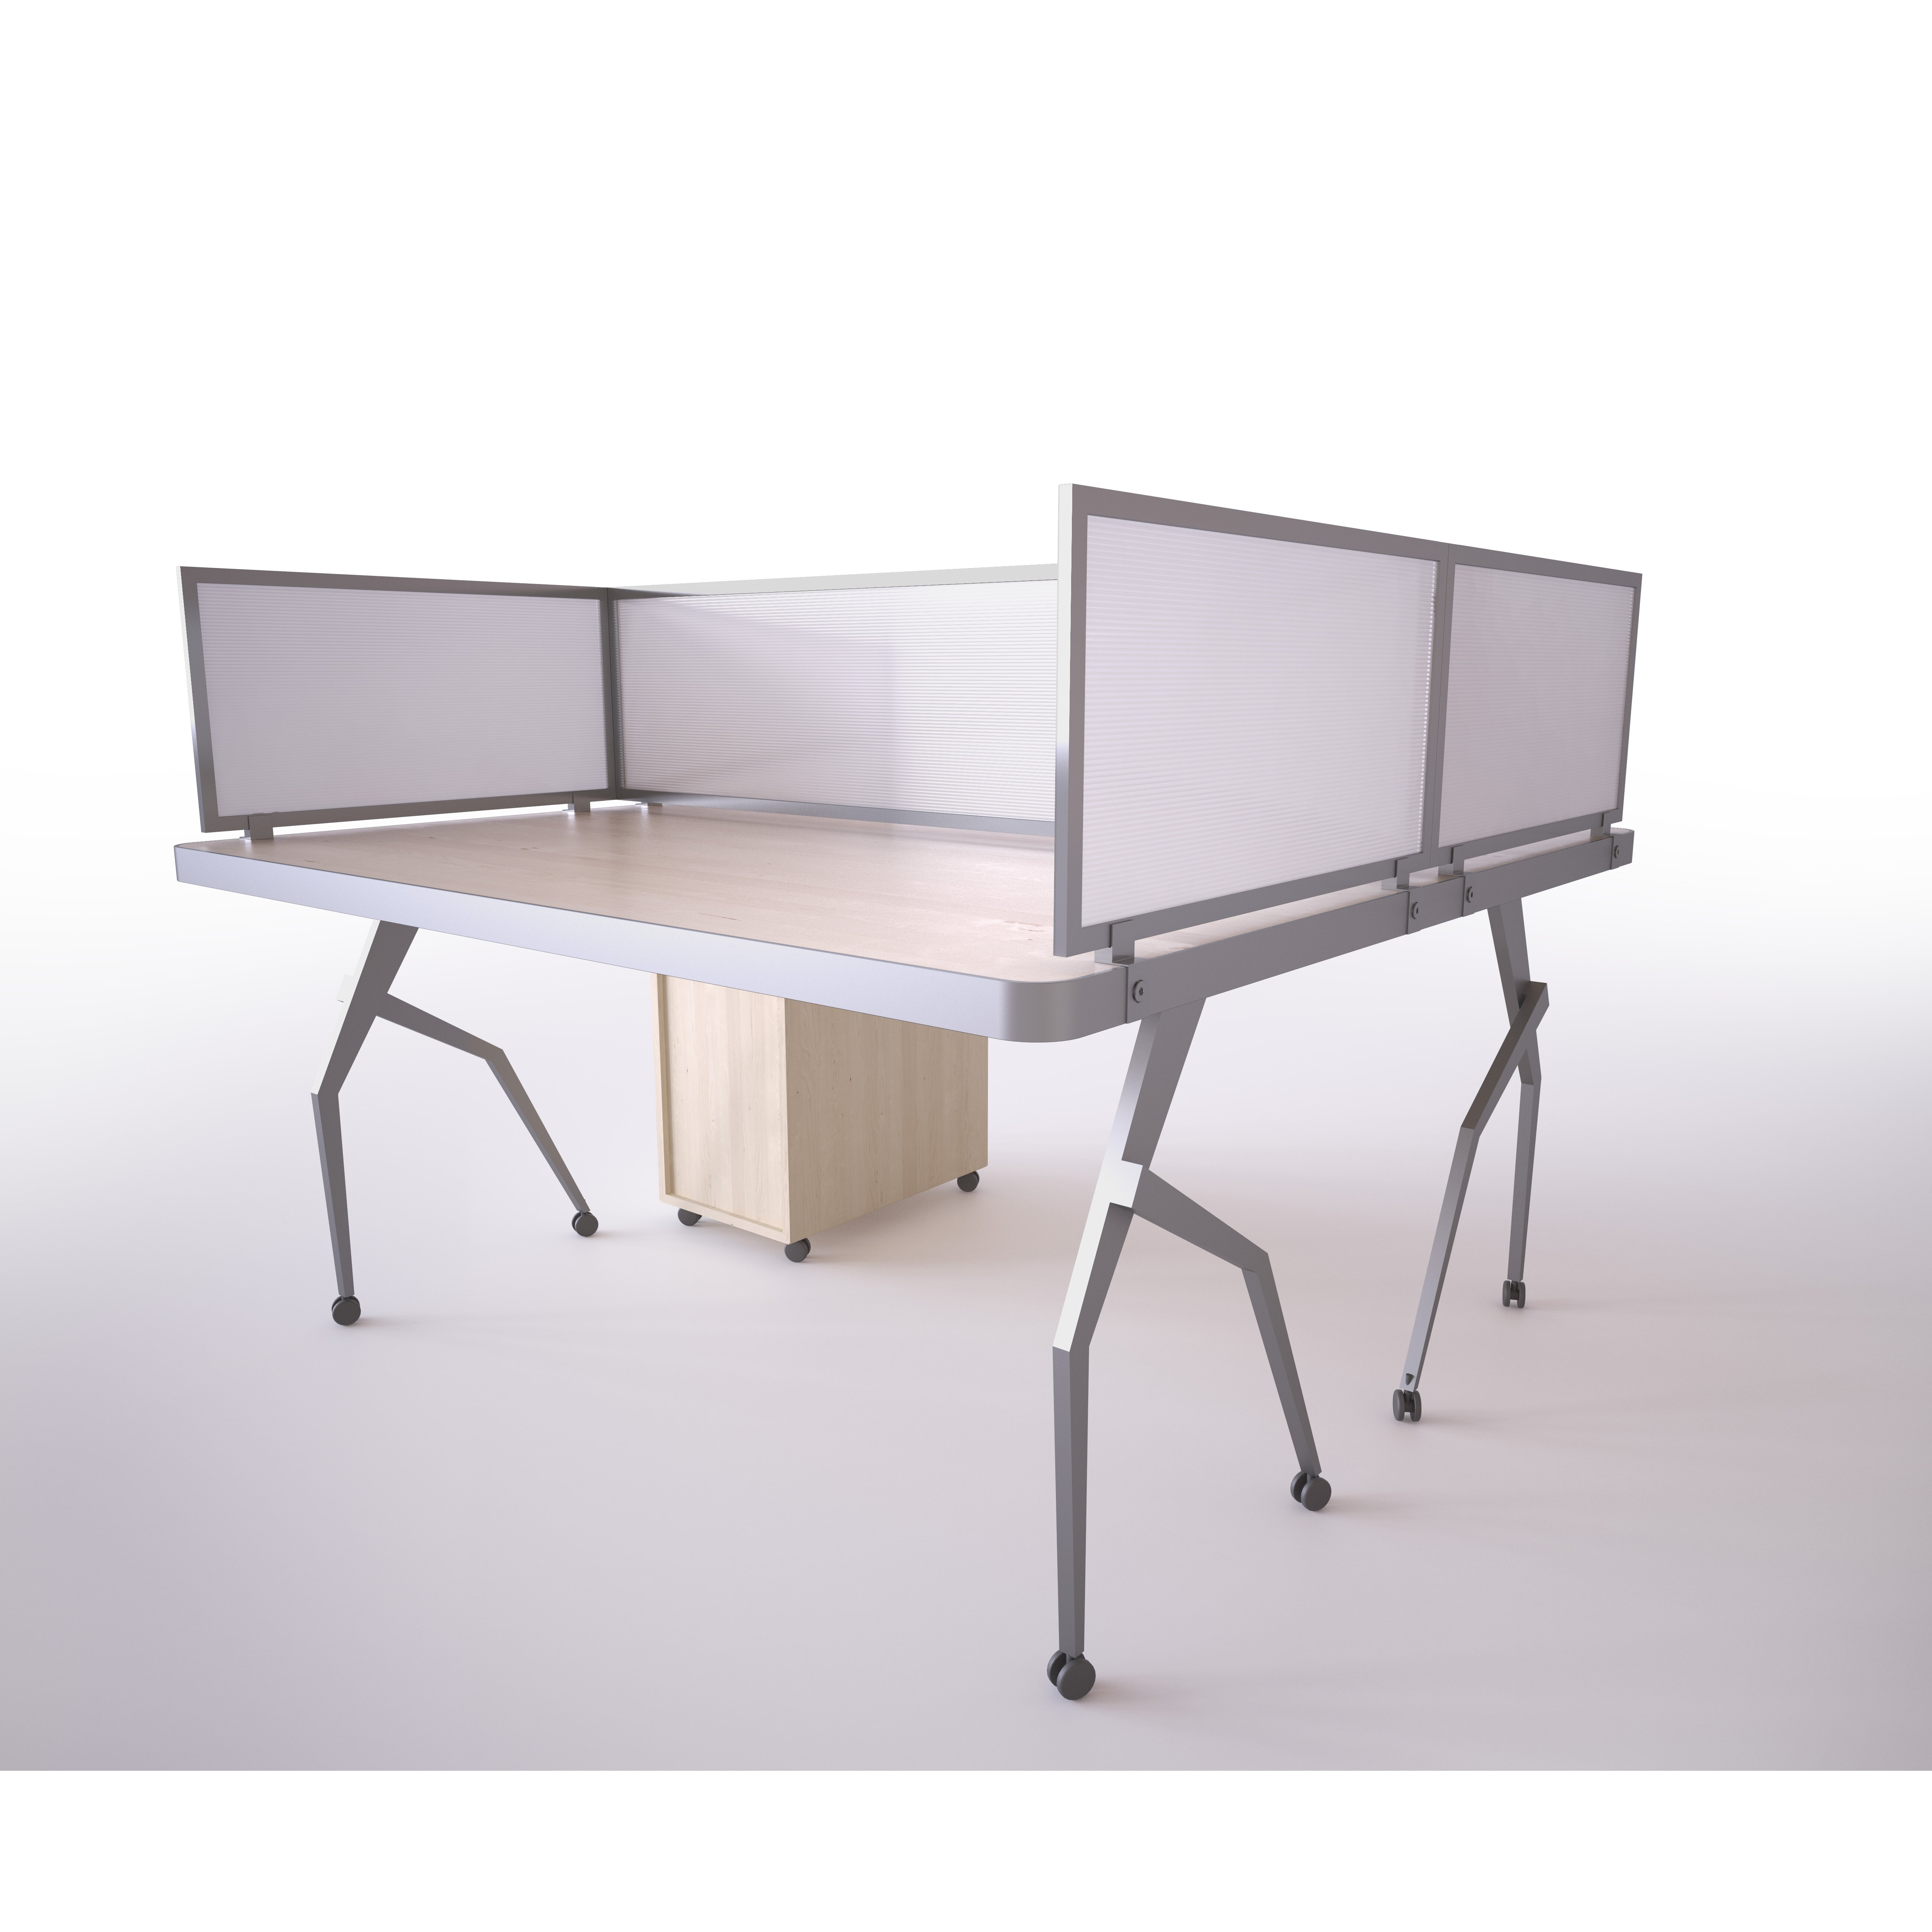 Obex Polycarbonate Desk Mounted Privacy Panel Allmodern